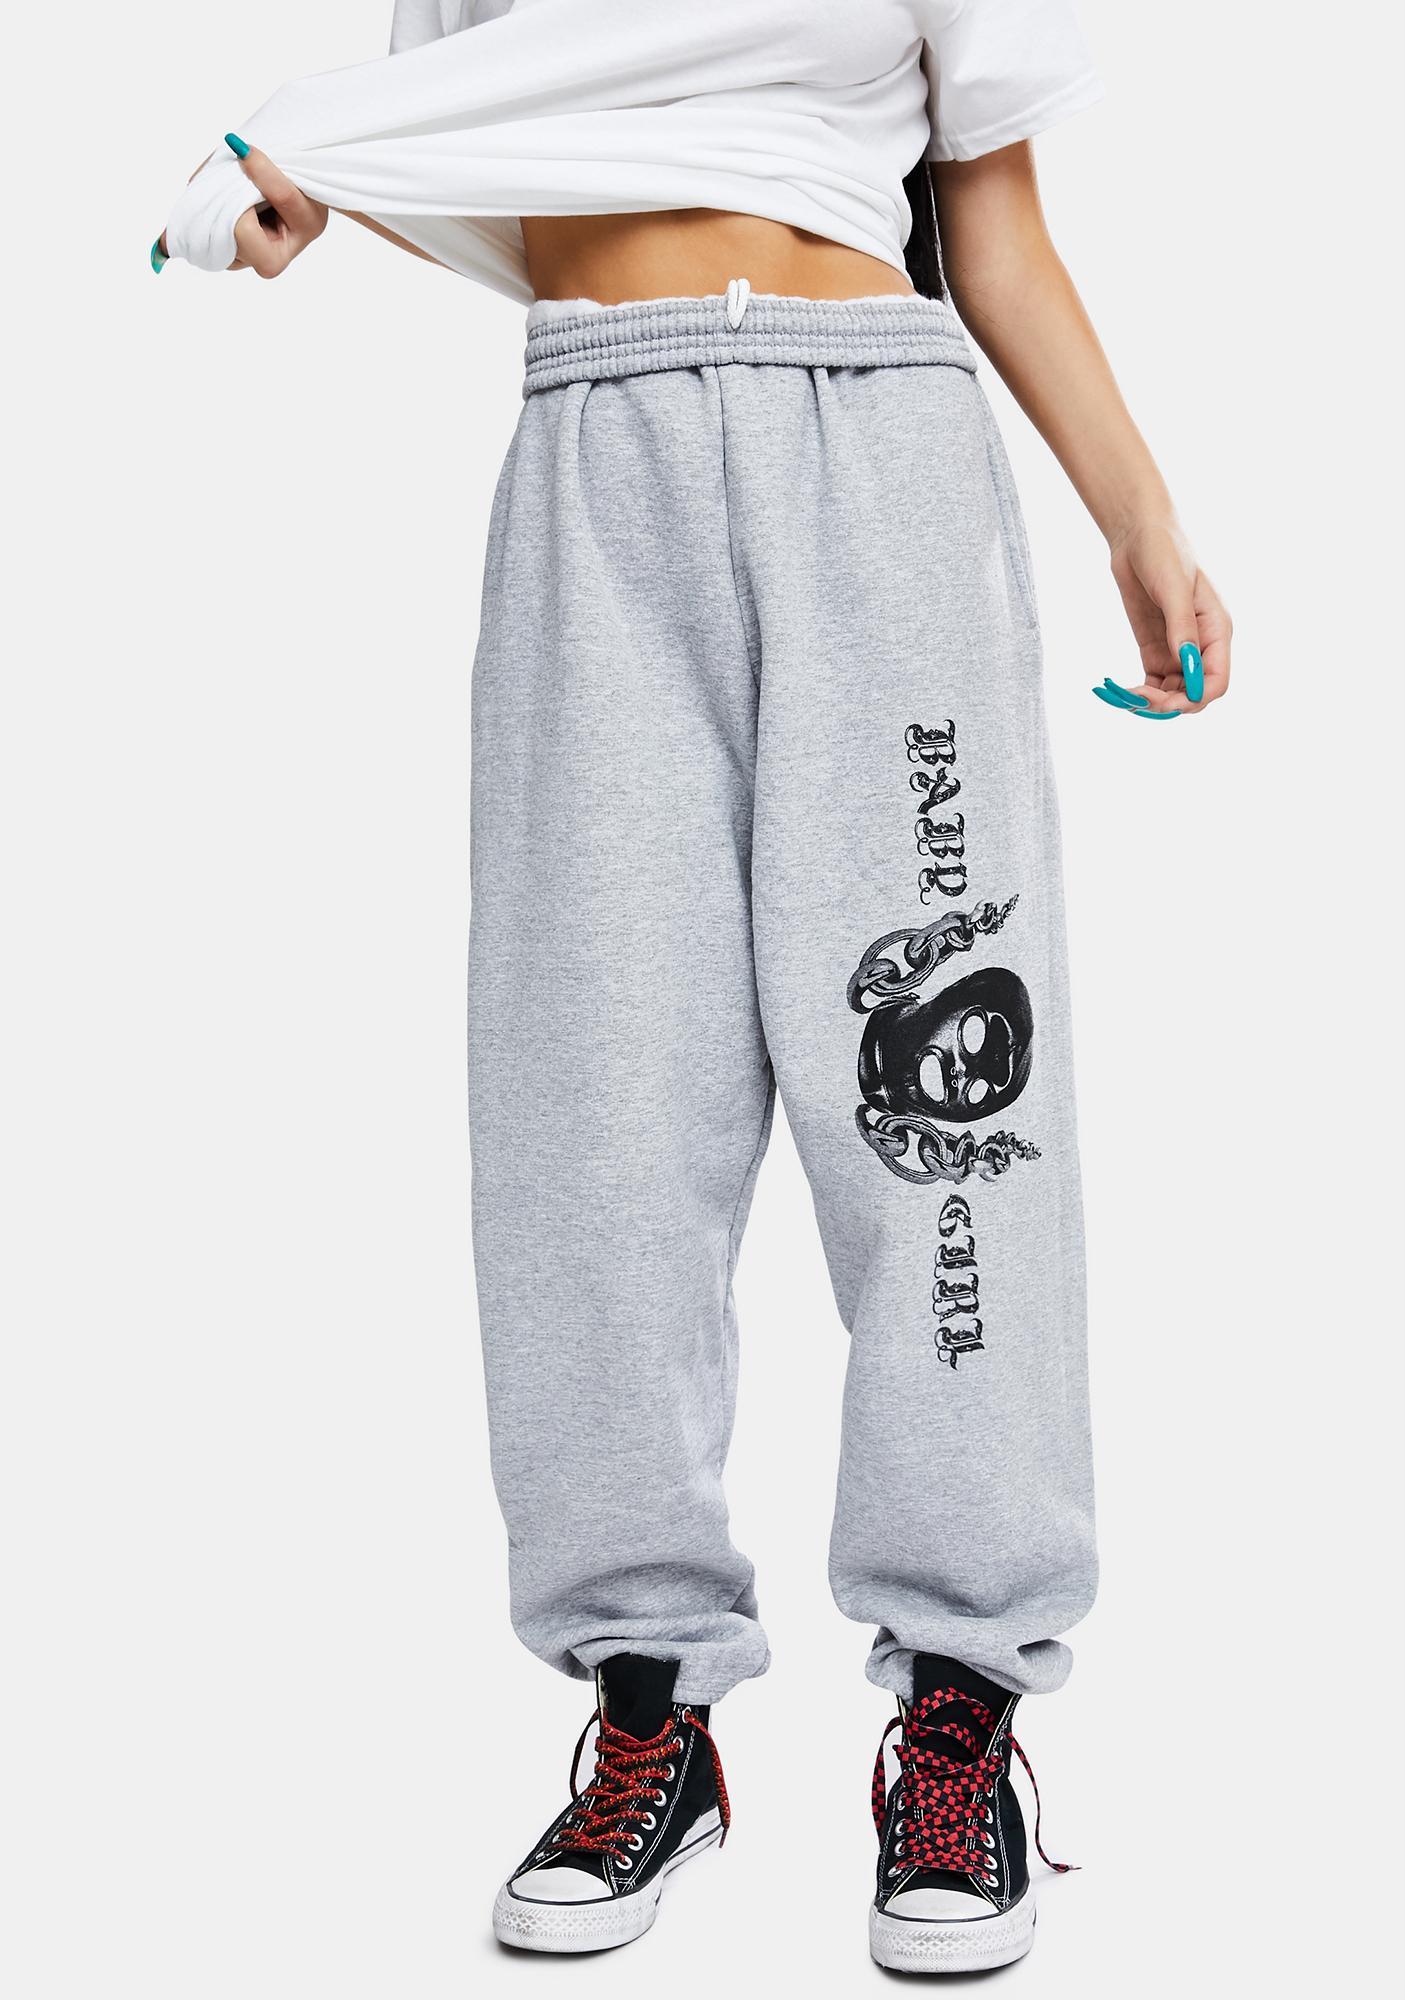 Dreamboy Gimp Sweatpants